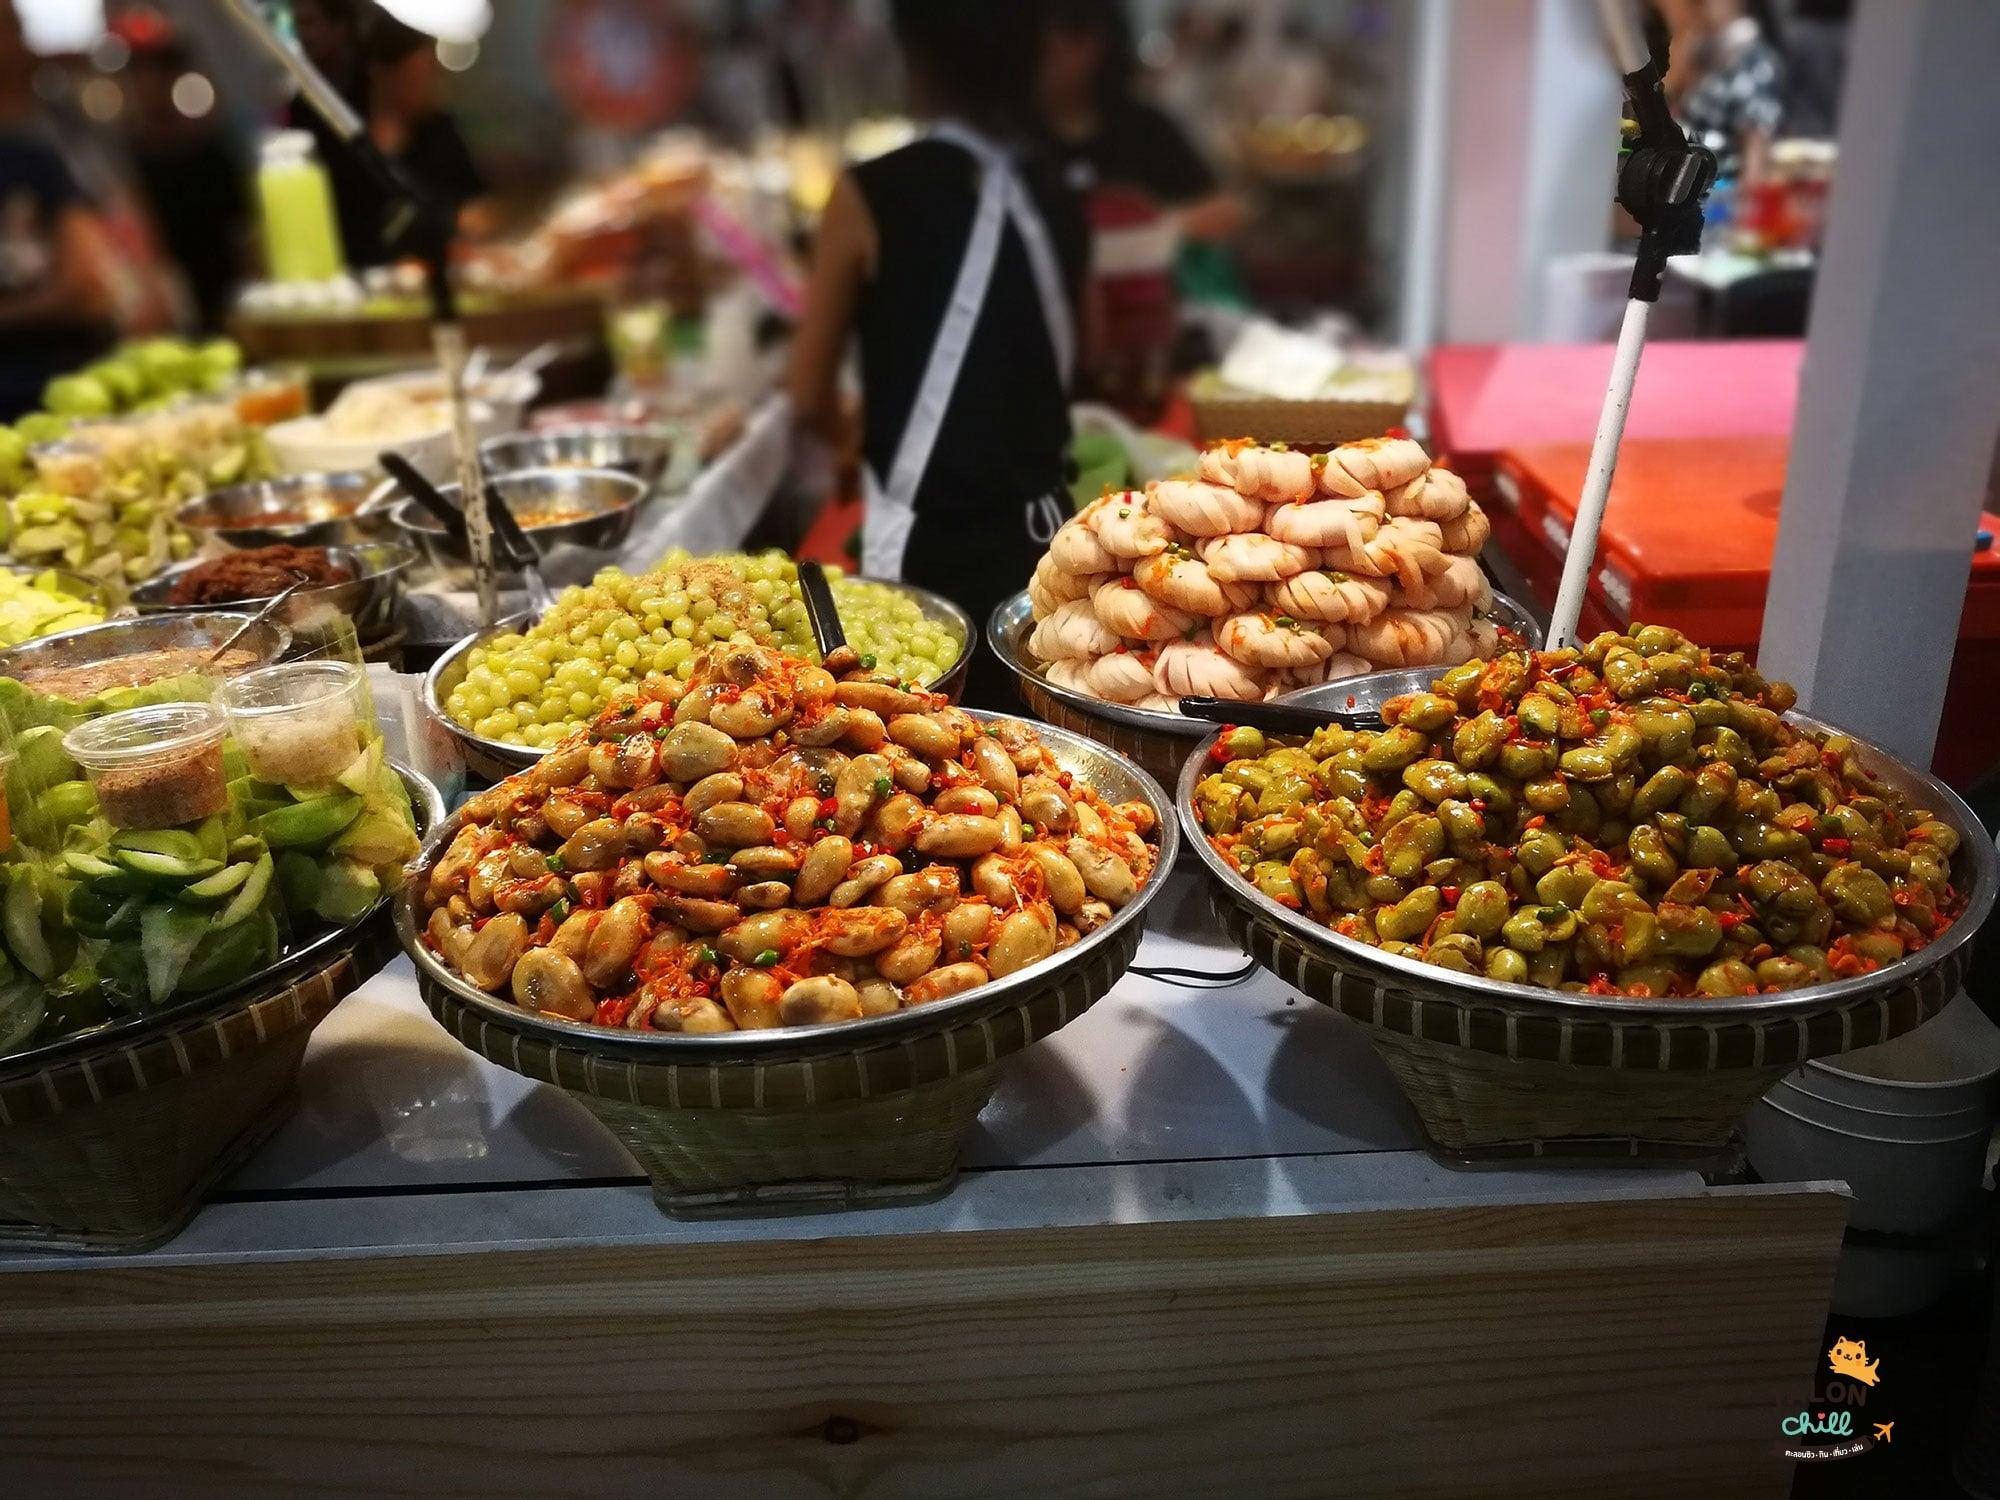 Nonthaburi Fruit Fest 2017 centralplaza rattanathibet 9